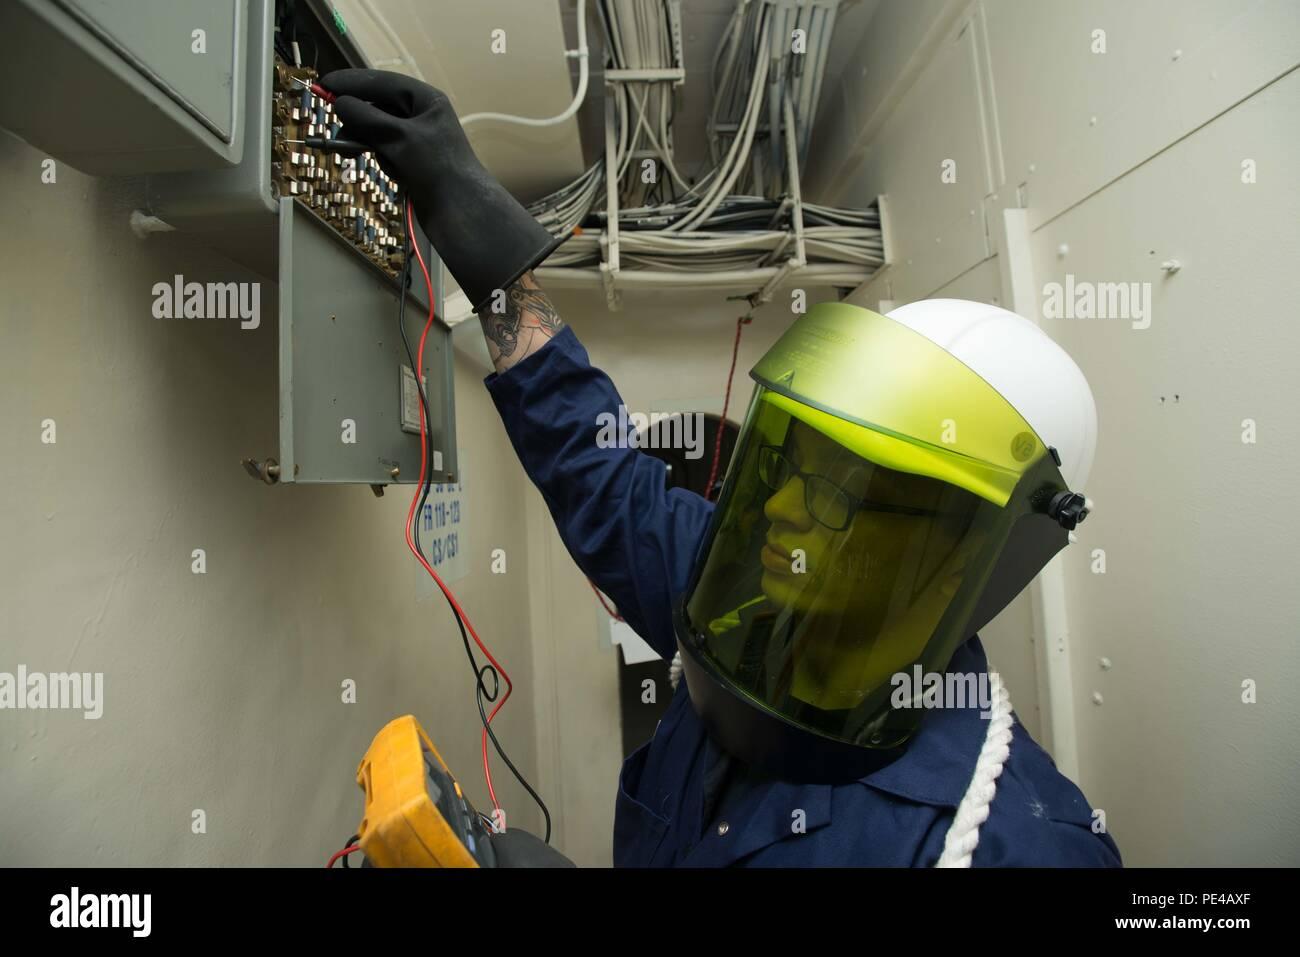 Navy Fuse Box on